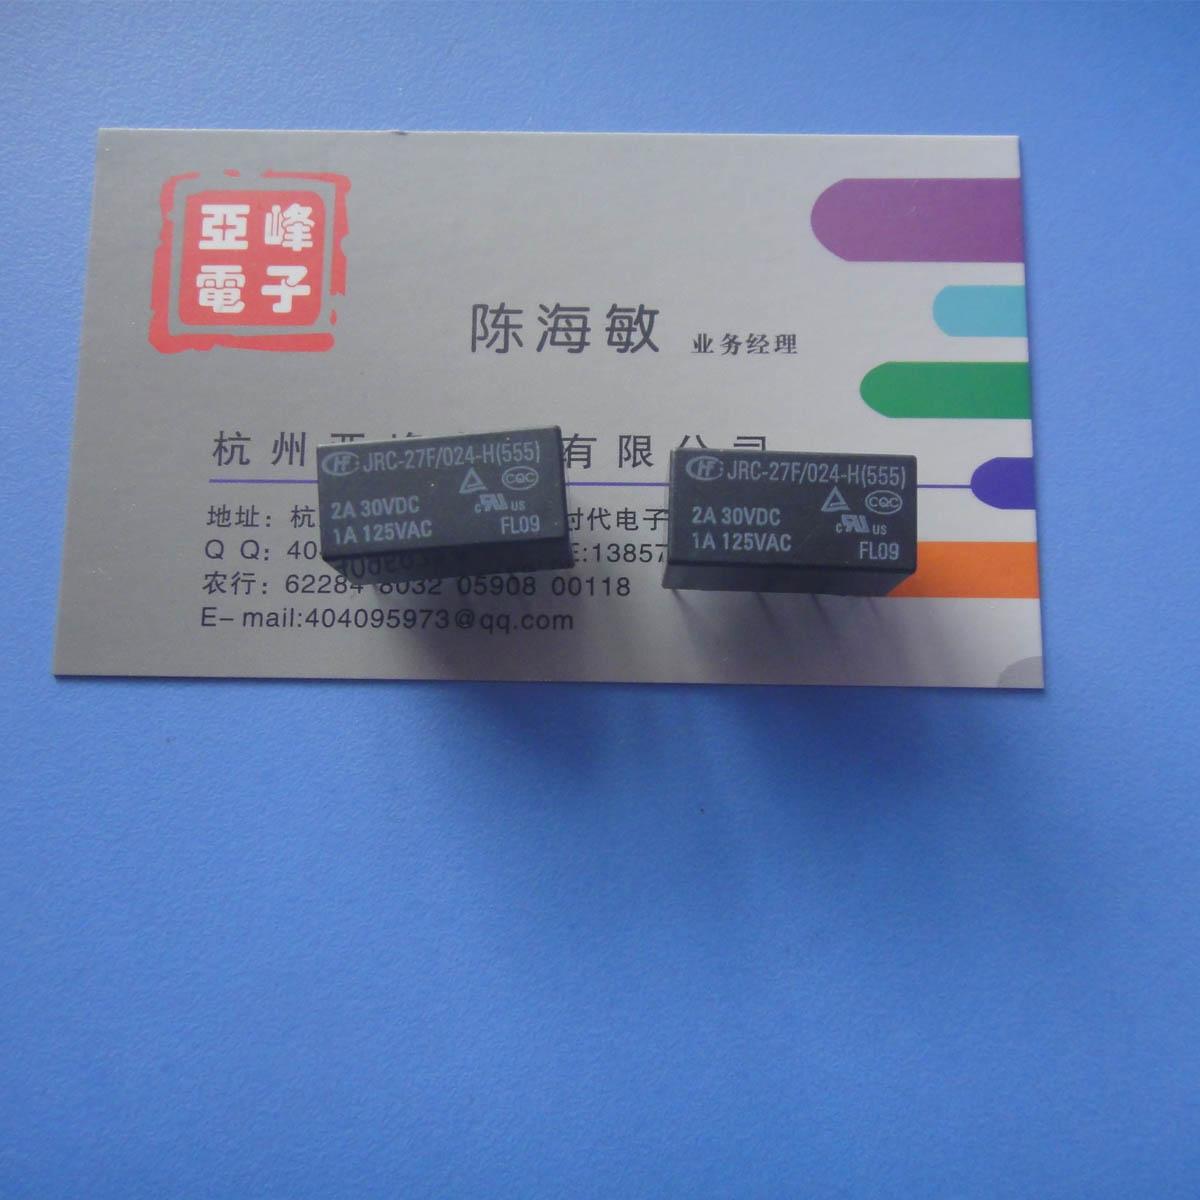 JRC-27F-024-H 81A125VAC 150MW(China (Mainland))